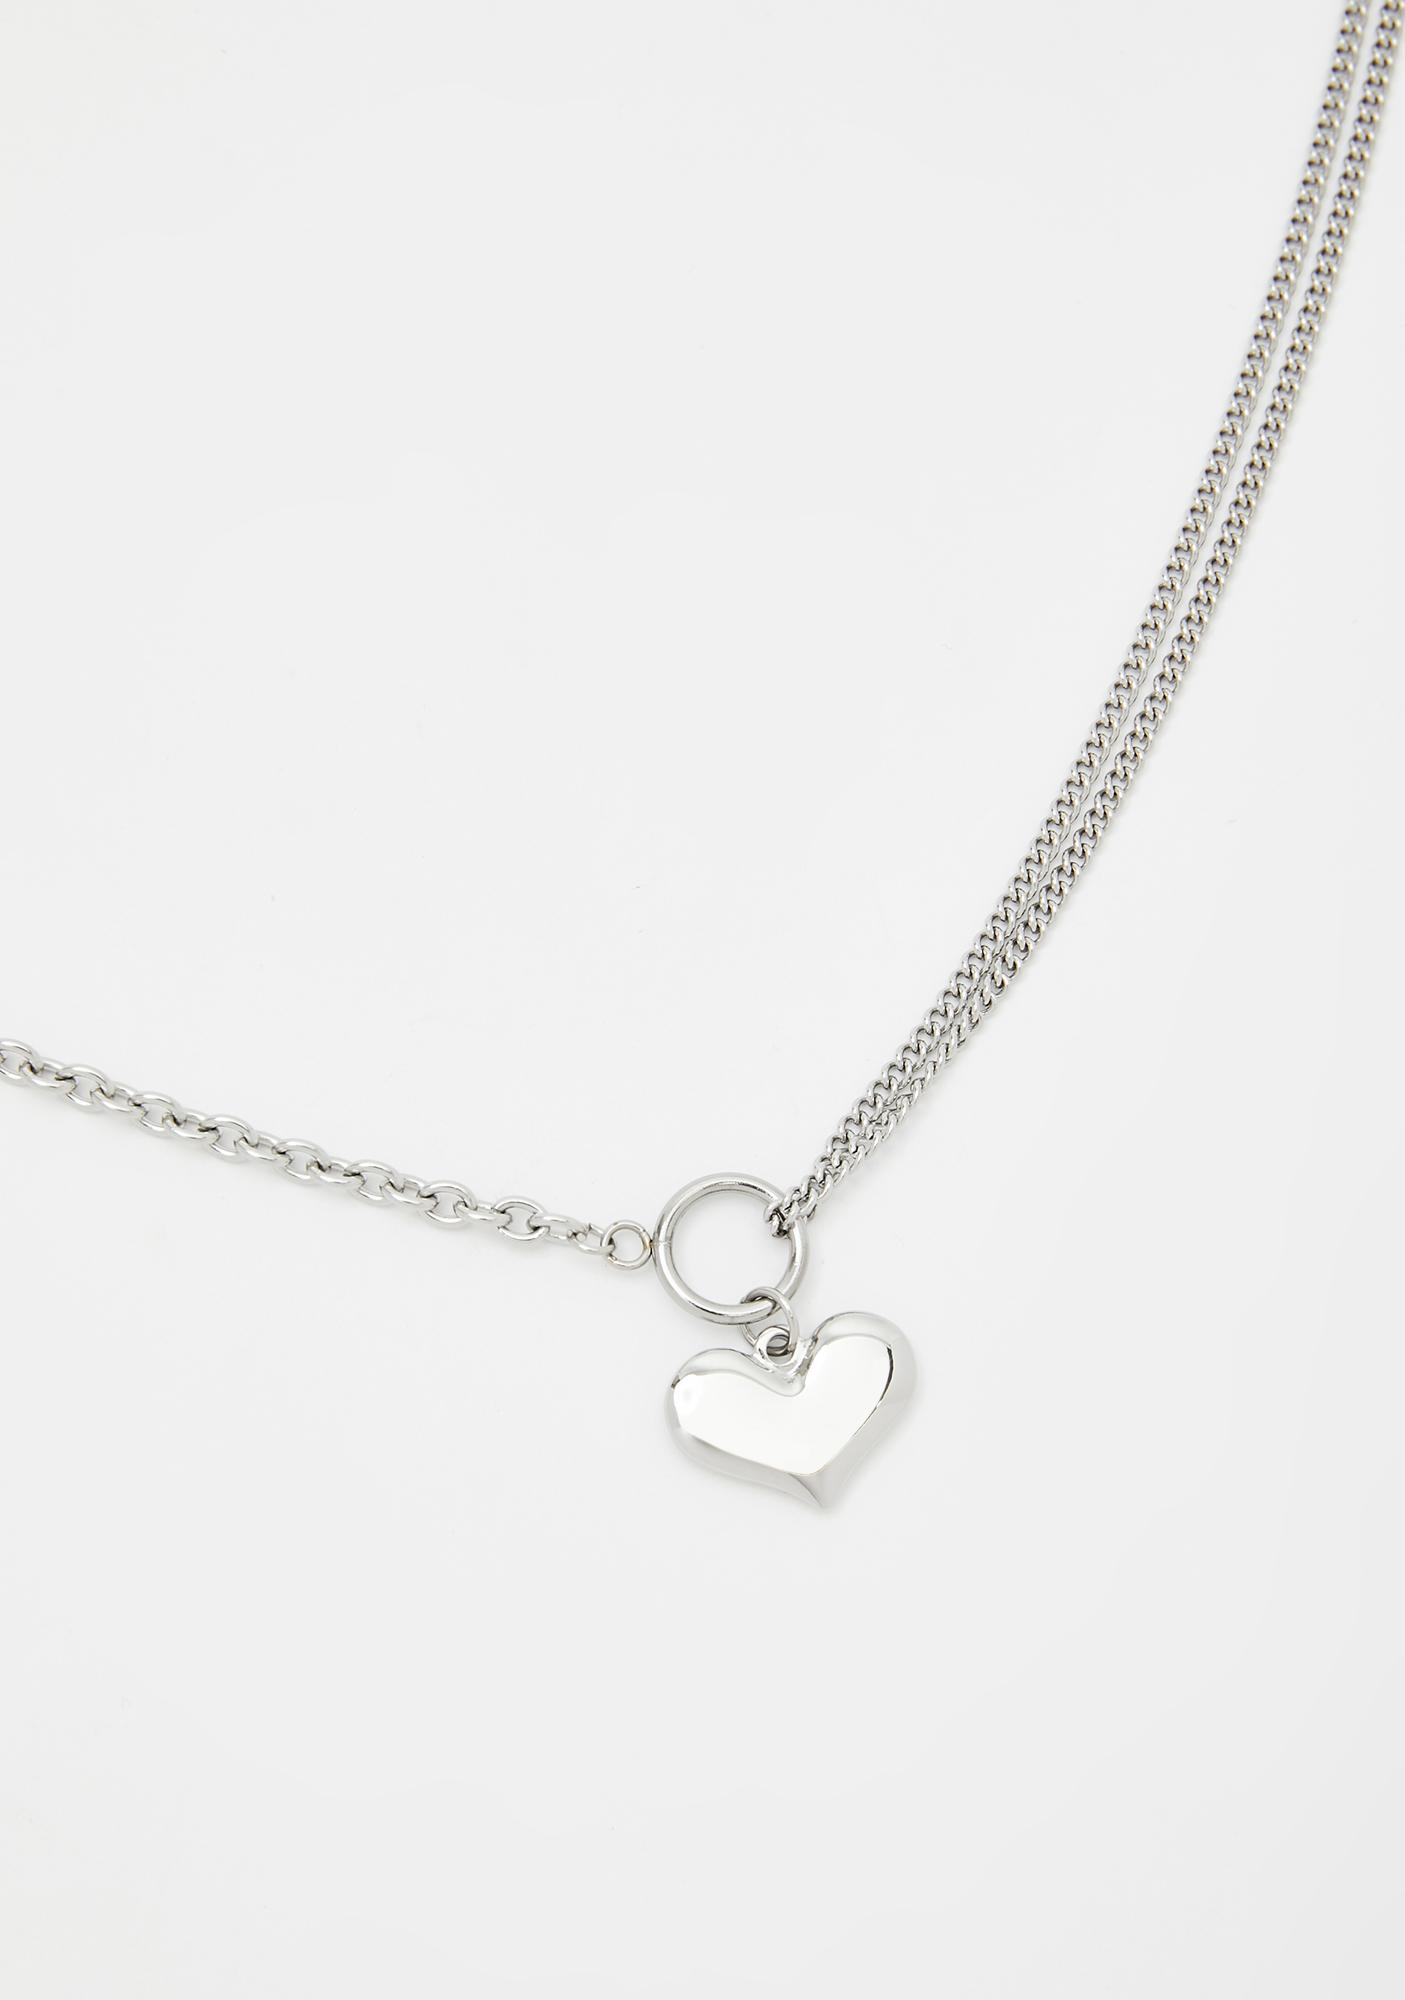 Blinding Love Heart Necklace